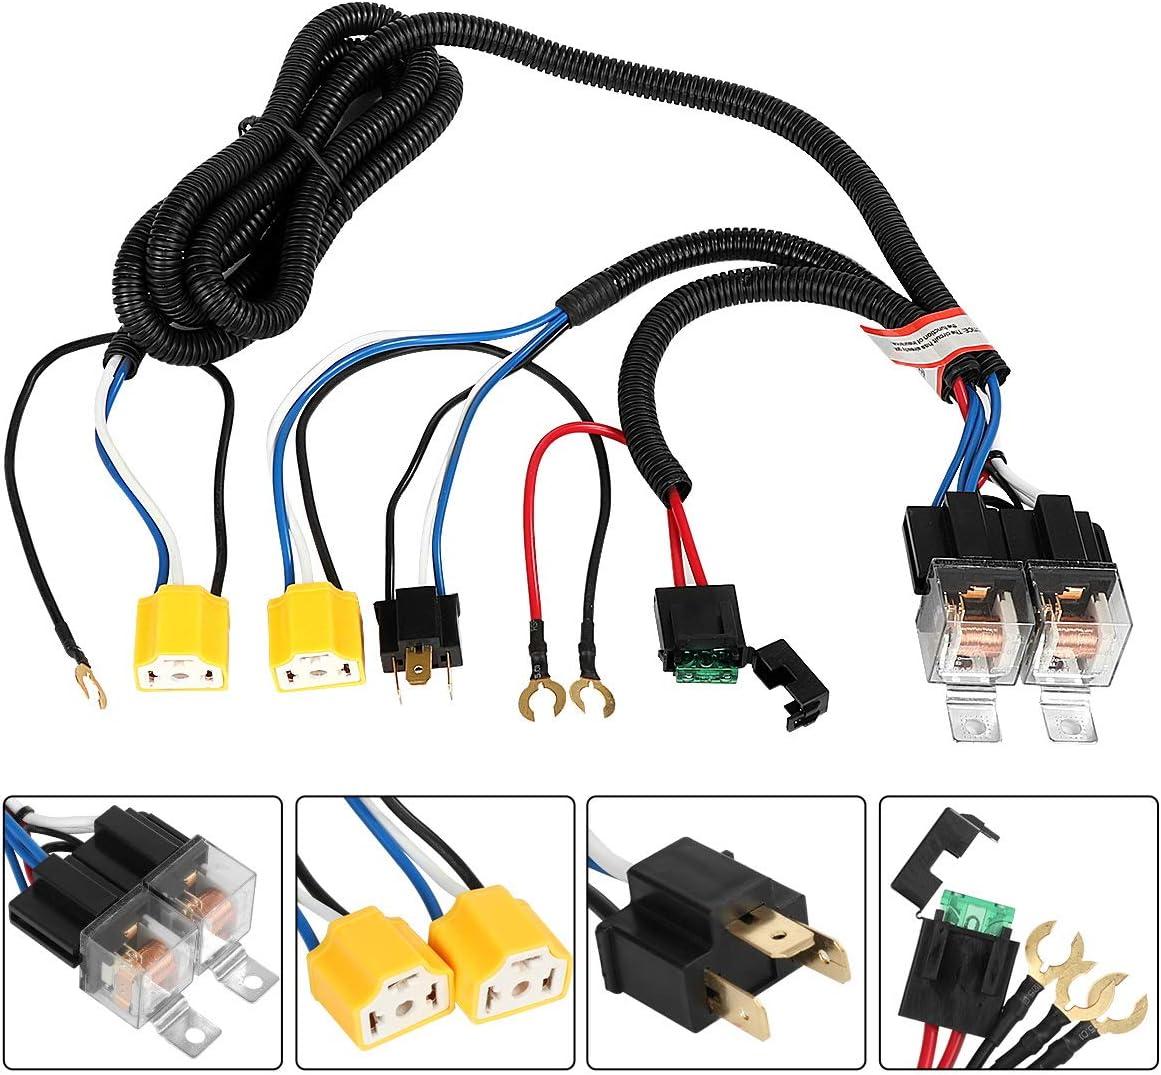 What's the Headlight Wiring Repair Cost